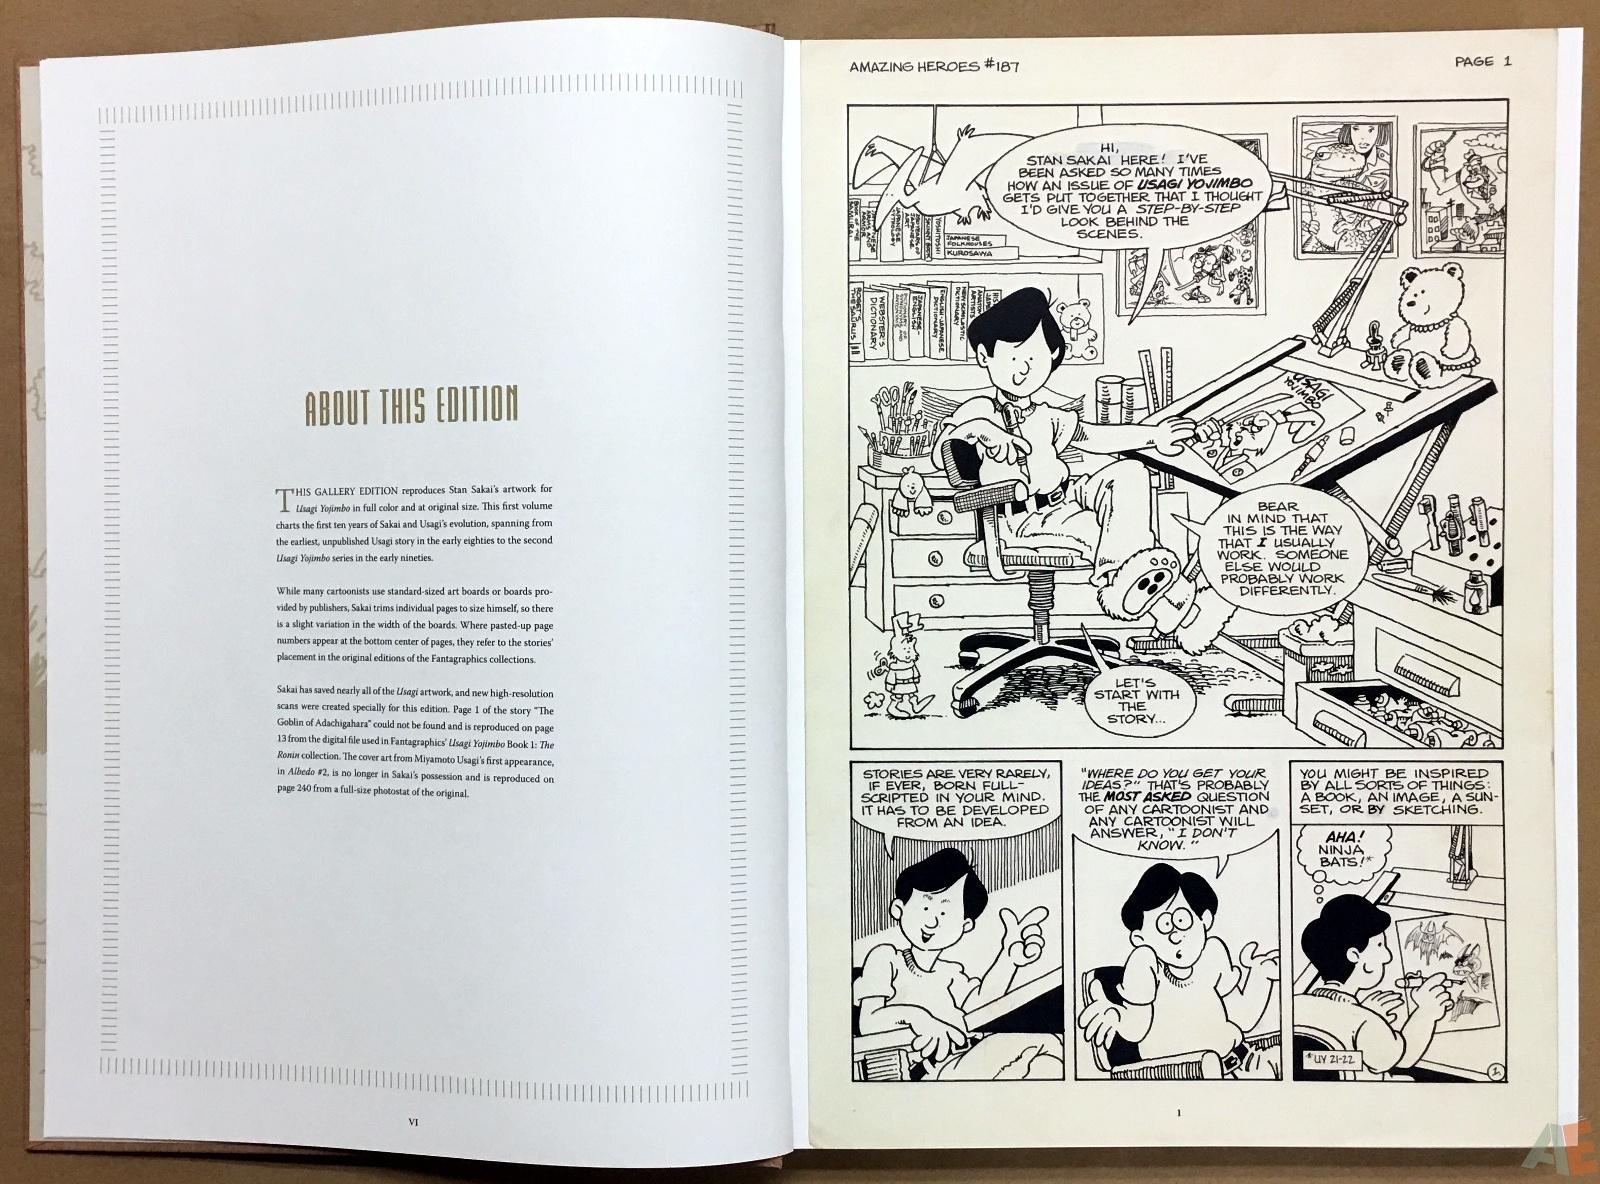 Usagi Yojimbo: Samurai and Other Stories Gallery Edition 8